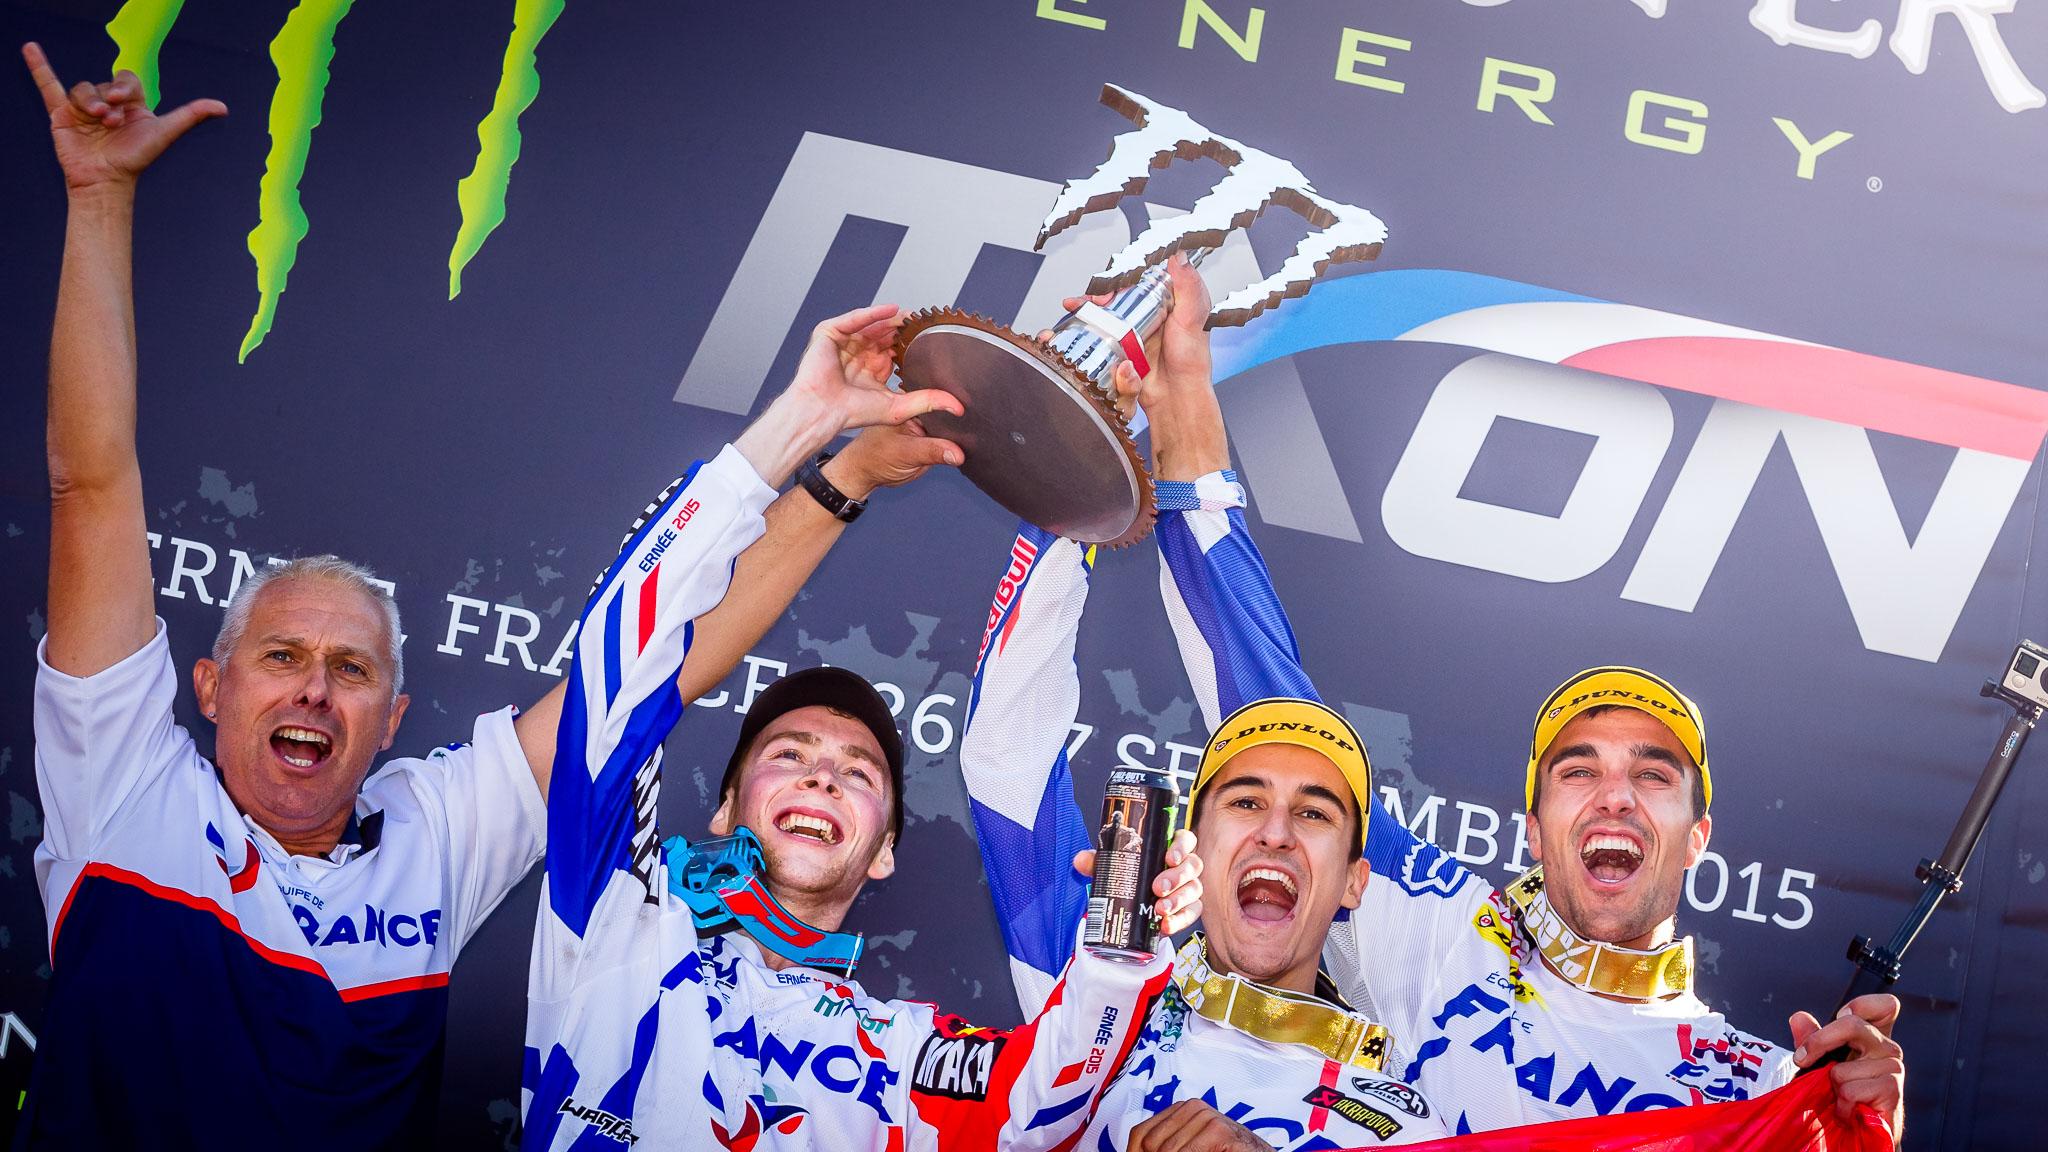 MXoN 2015 Ernée Motocross of Nations Team France the Champs